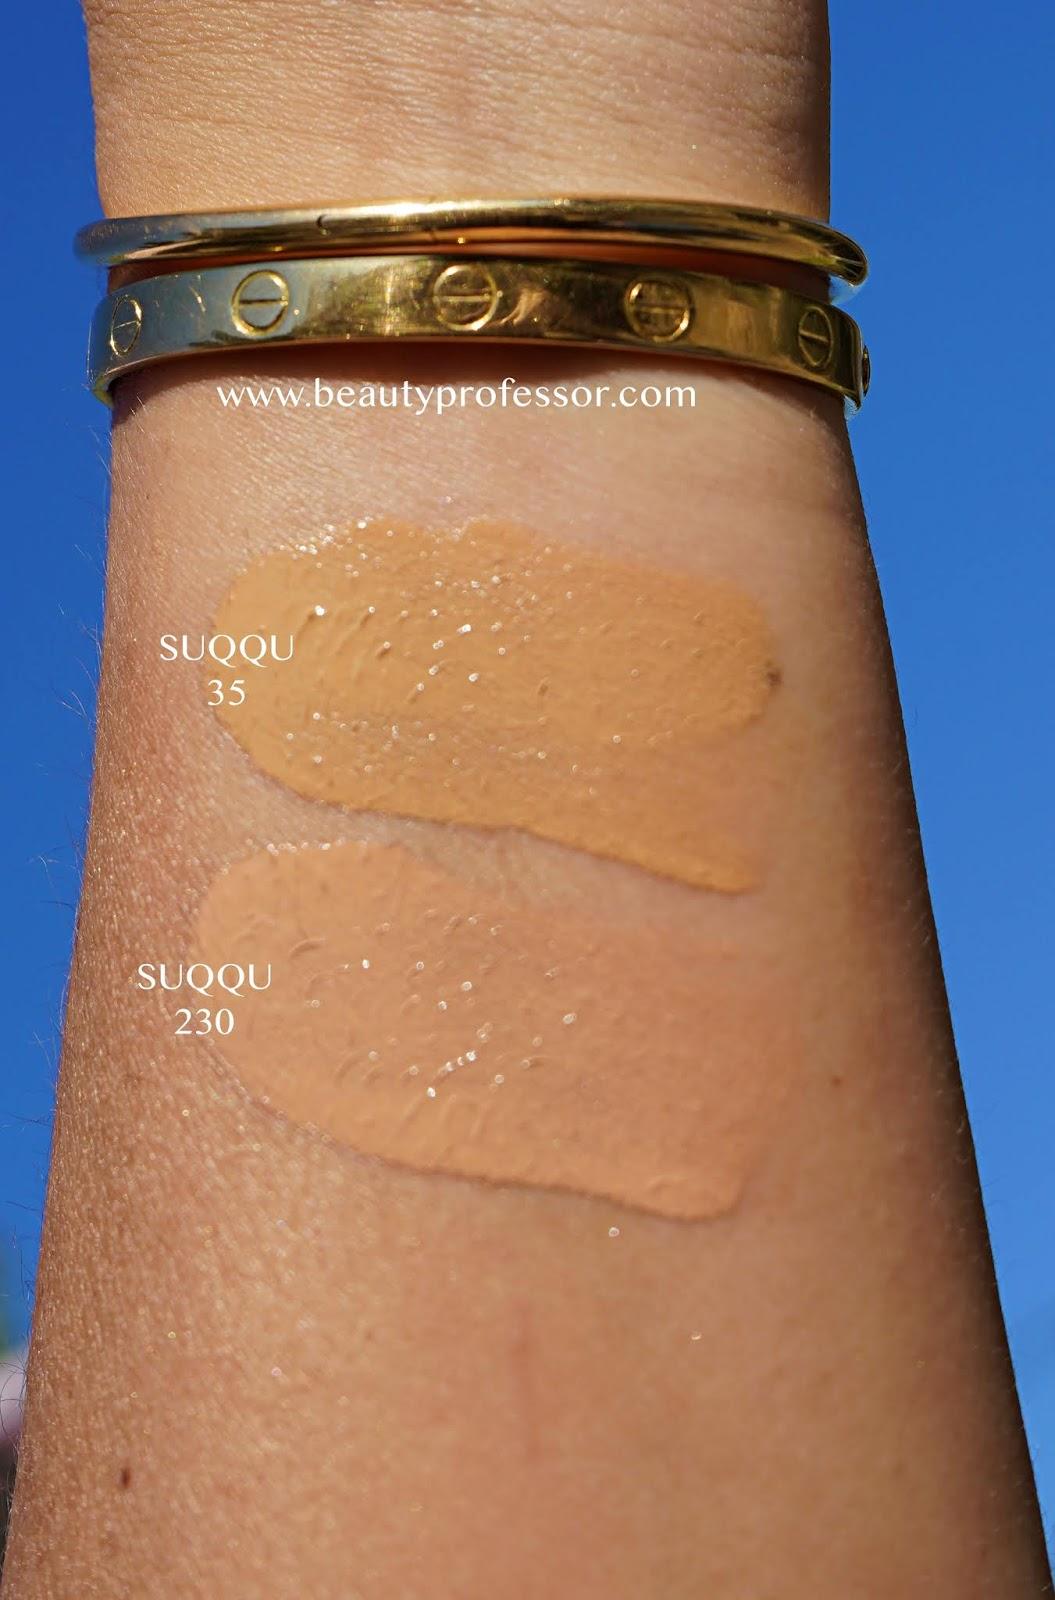 SUQQU Nude Wear EX Liquid Foundation swatches